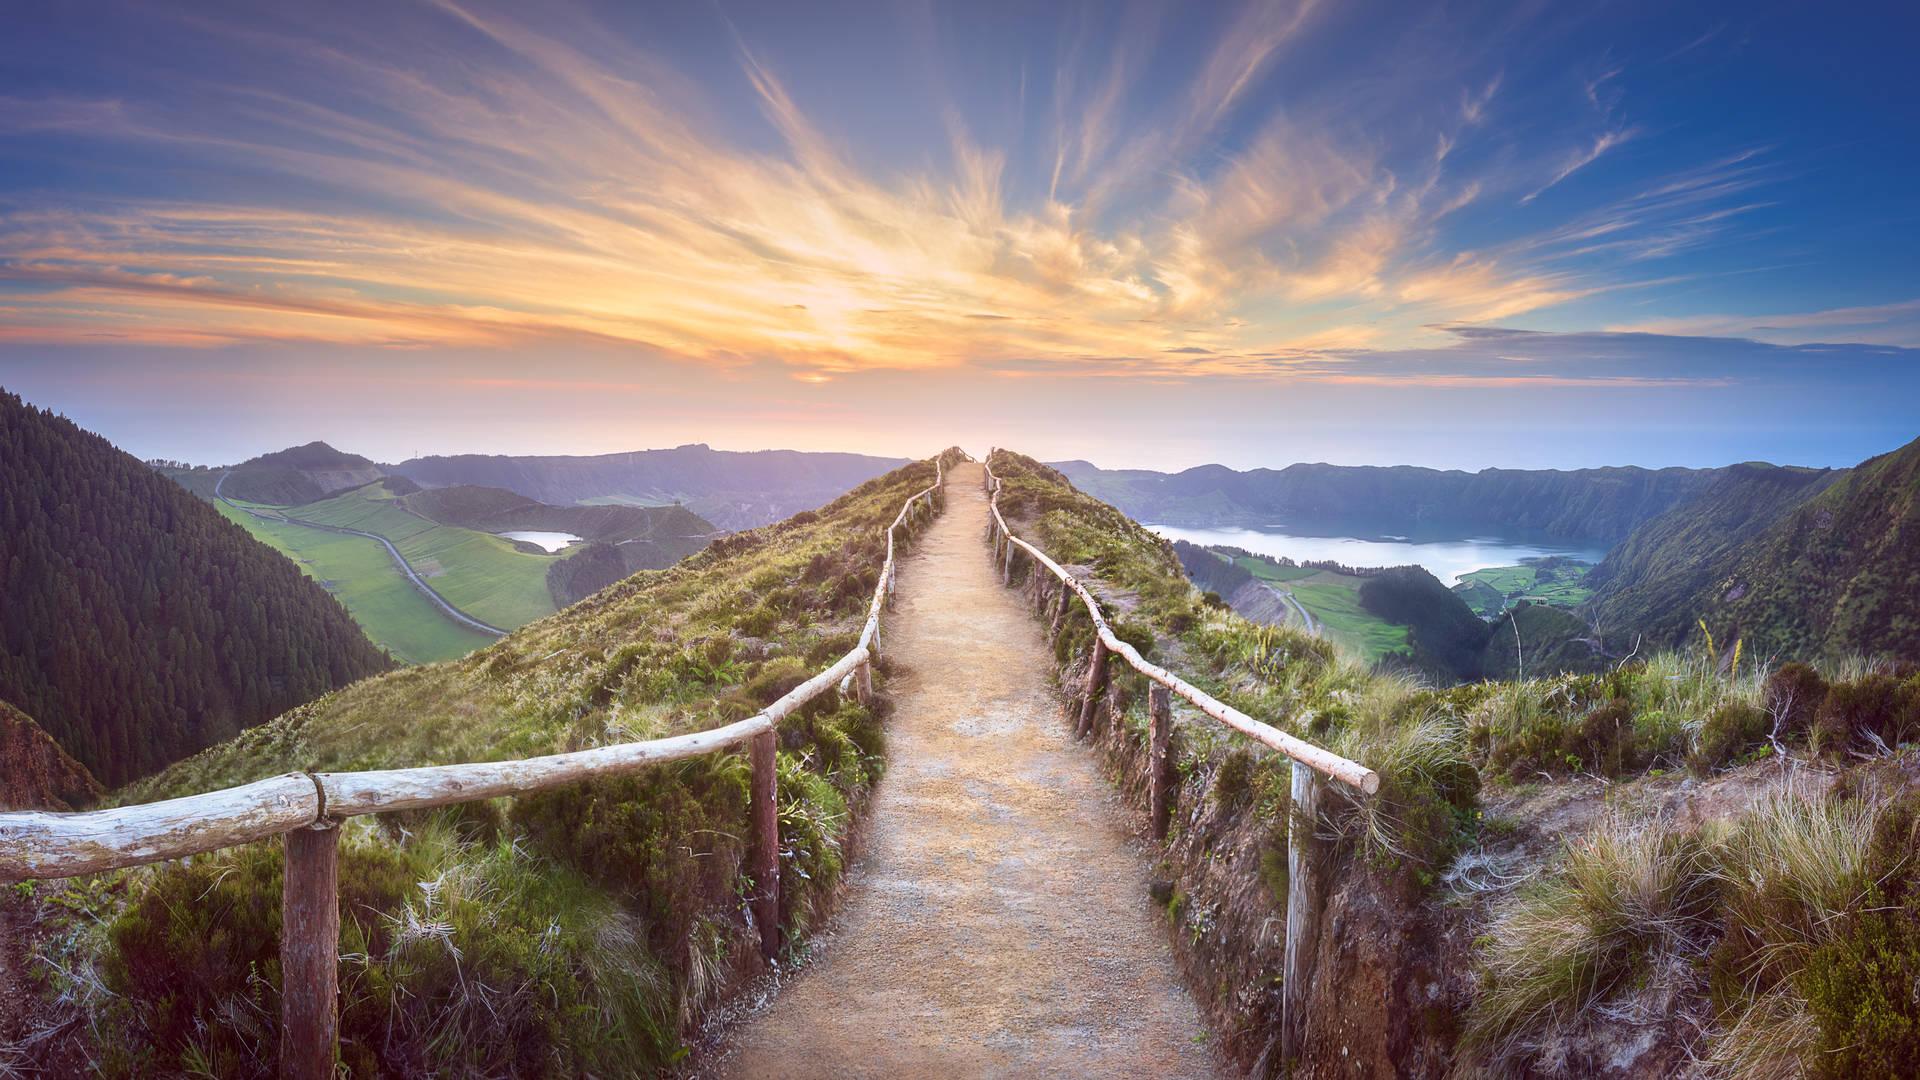 Legendes op de Azoren: Sete Cidades en de tranen van princes Antilia